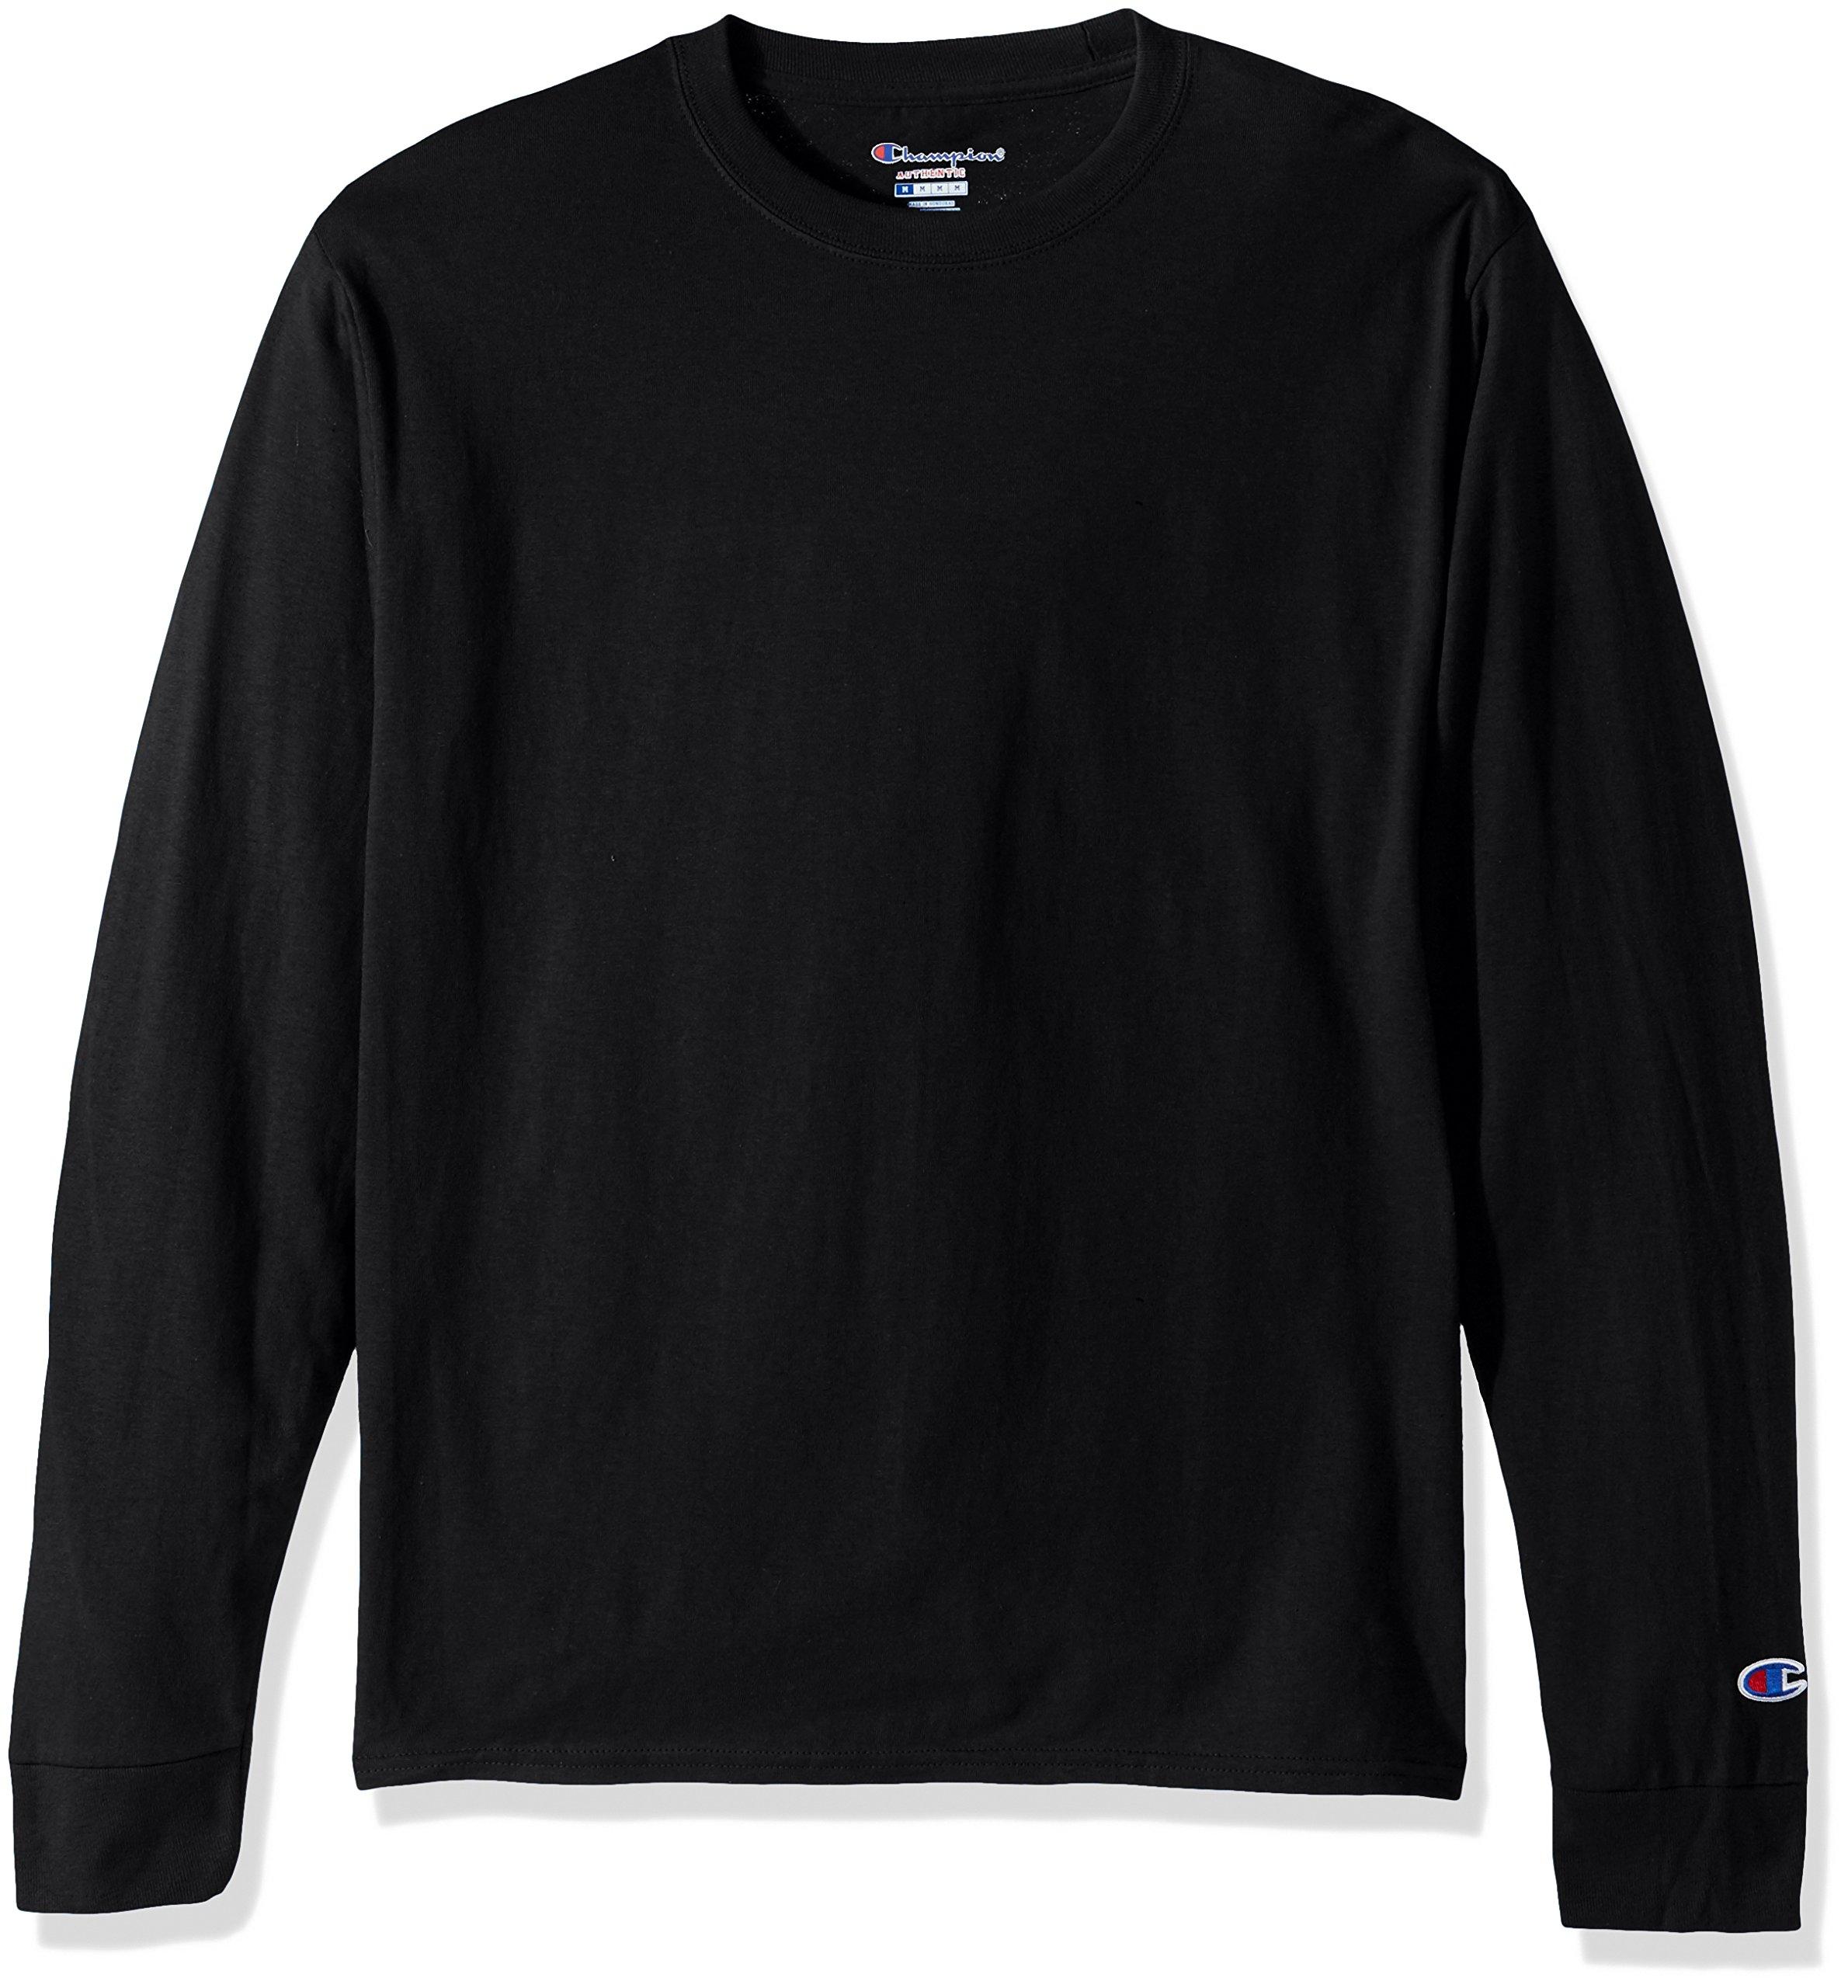 Champion LIFE Men's Cotton Long Sleeve Tee, Black Large